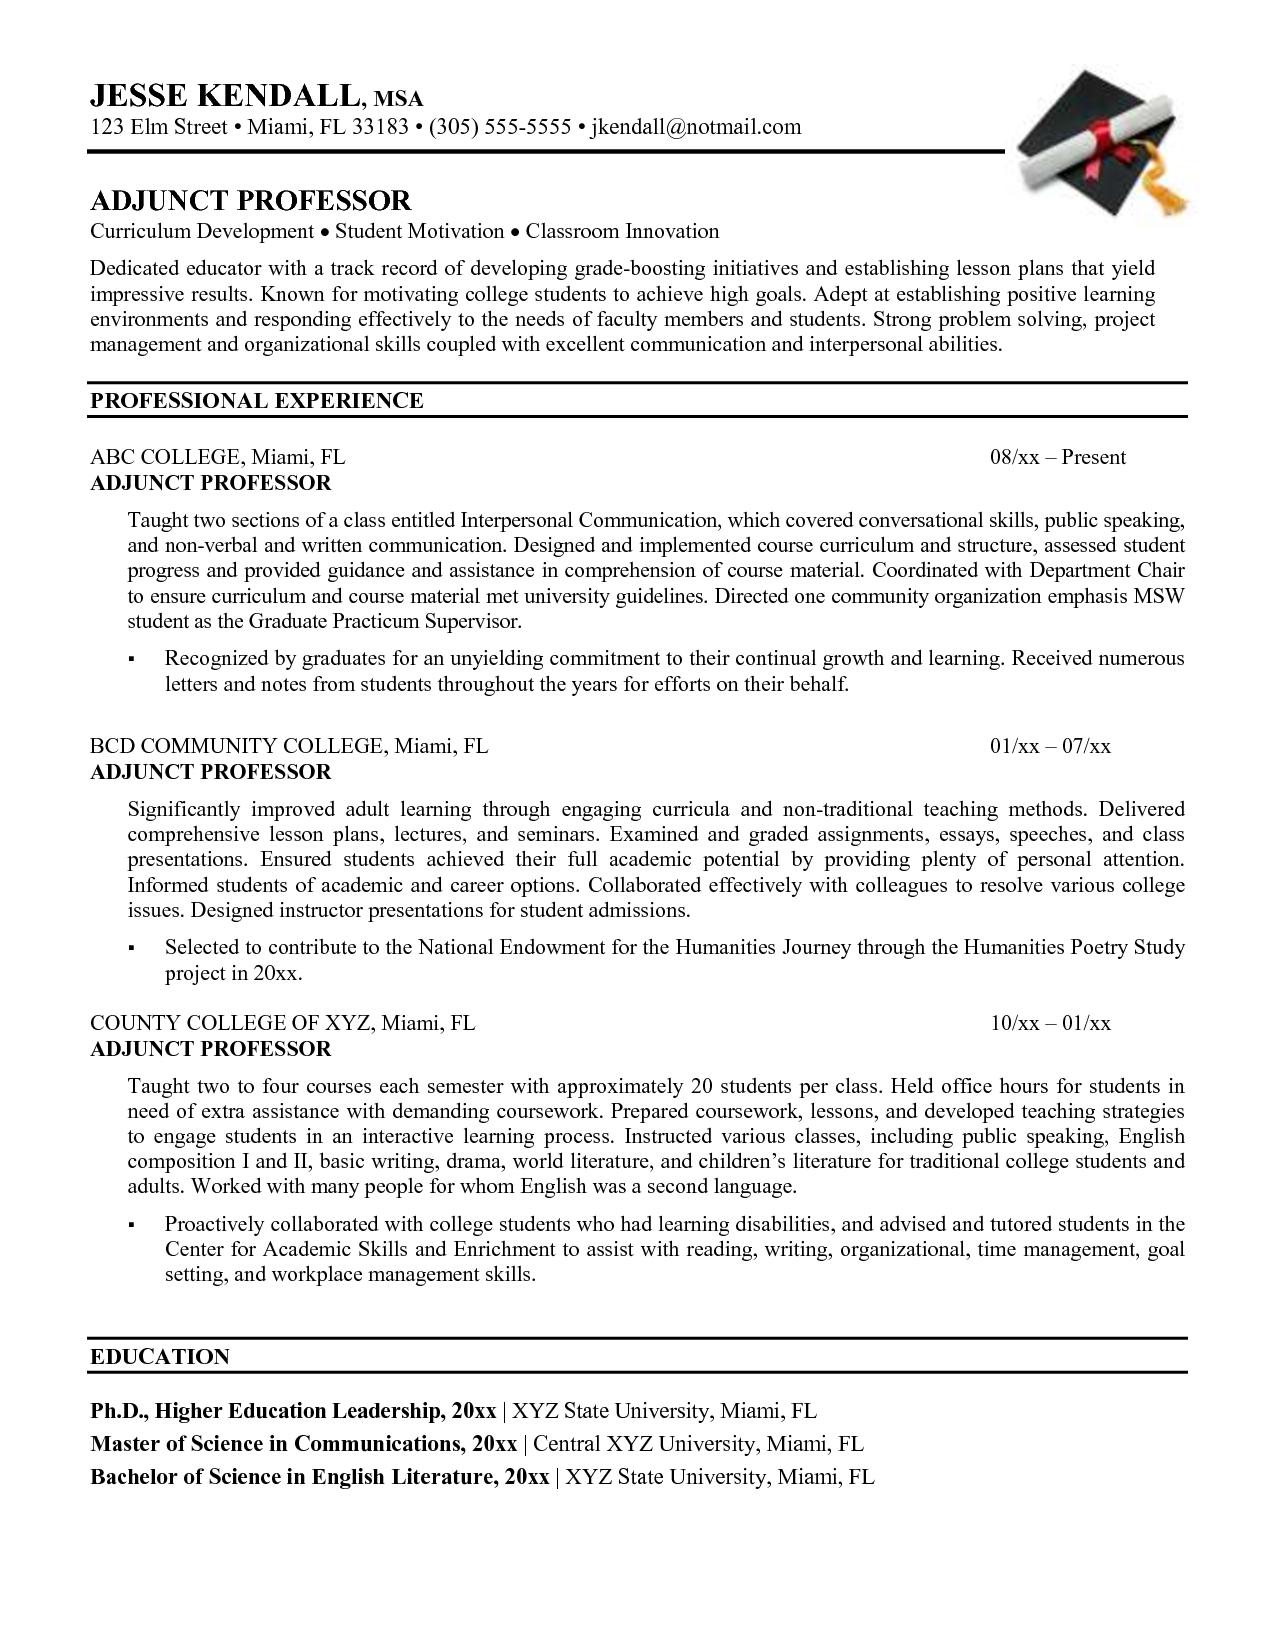 sample resume for faculty position engineering Adjunct Professor Resume  Best Template